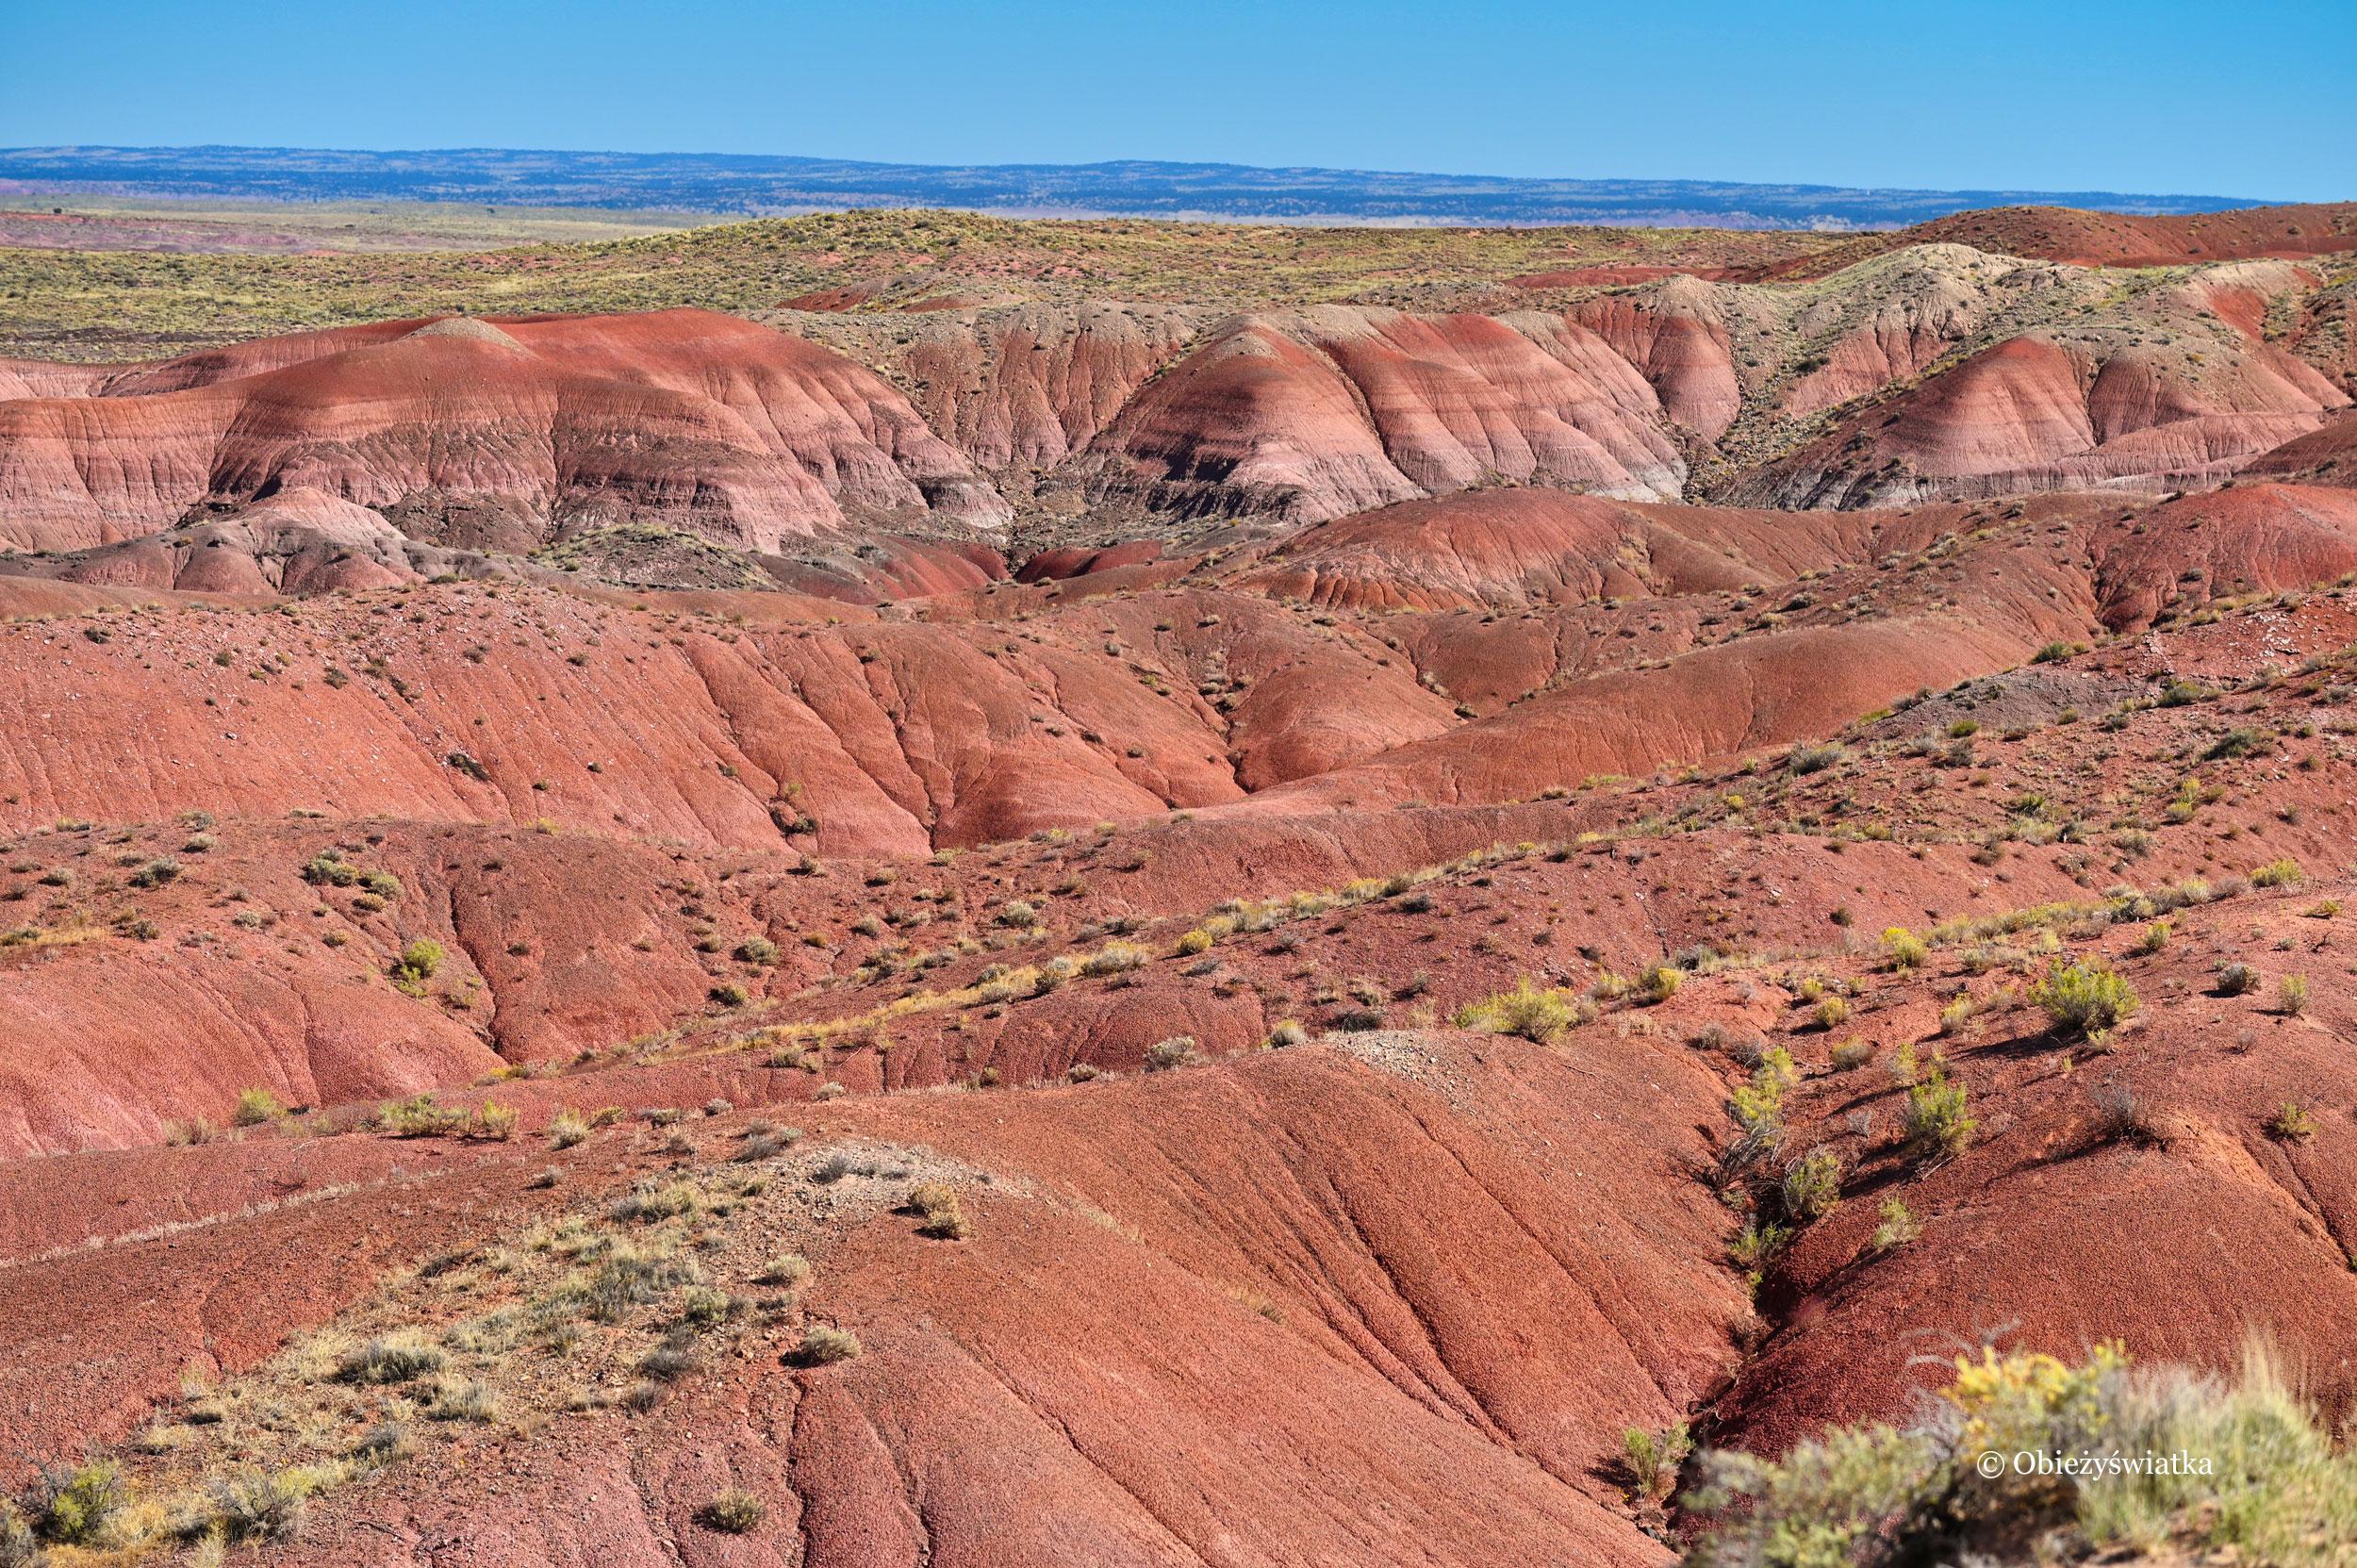 Kolorowe wzgórza aż po horyzontu kres... - Painted Desert, Arizona